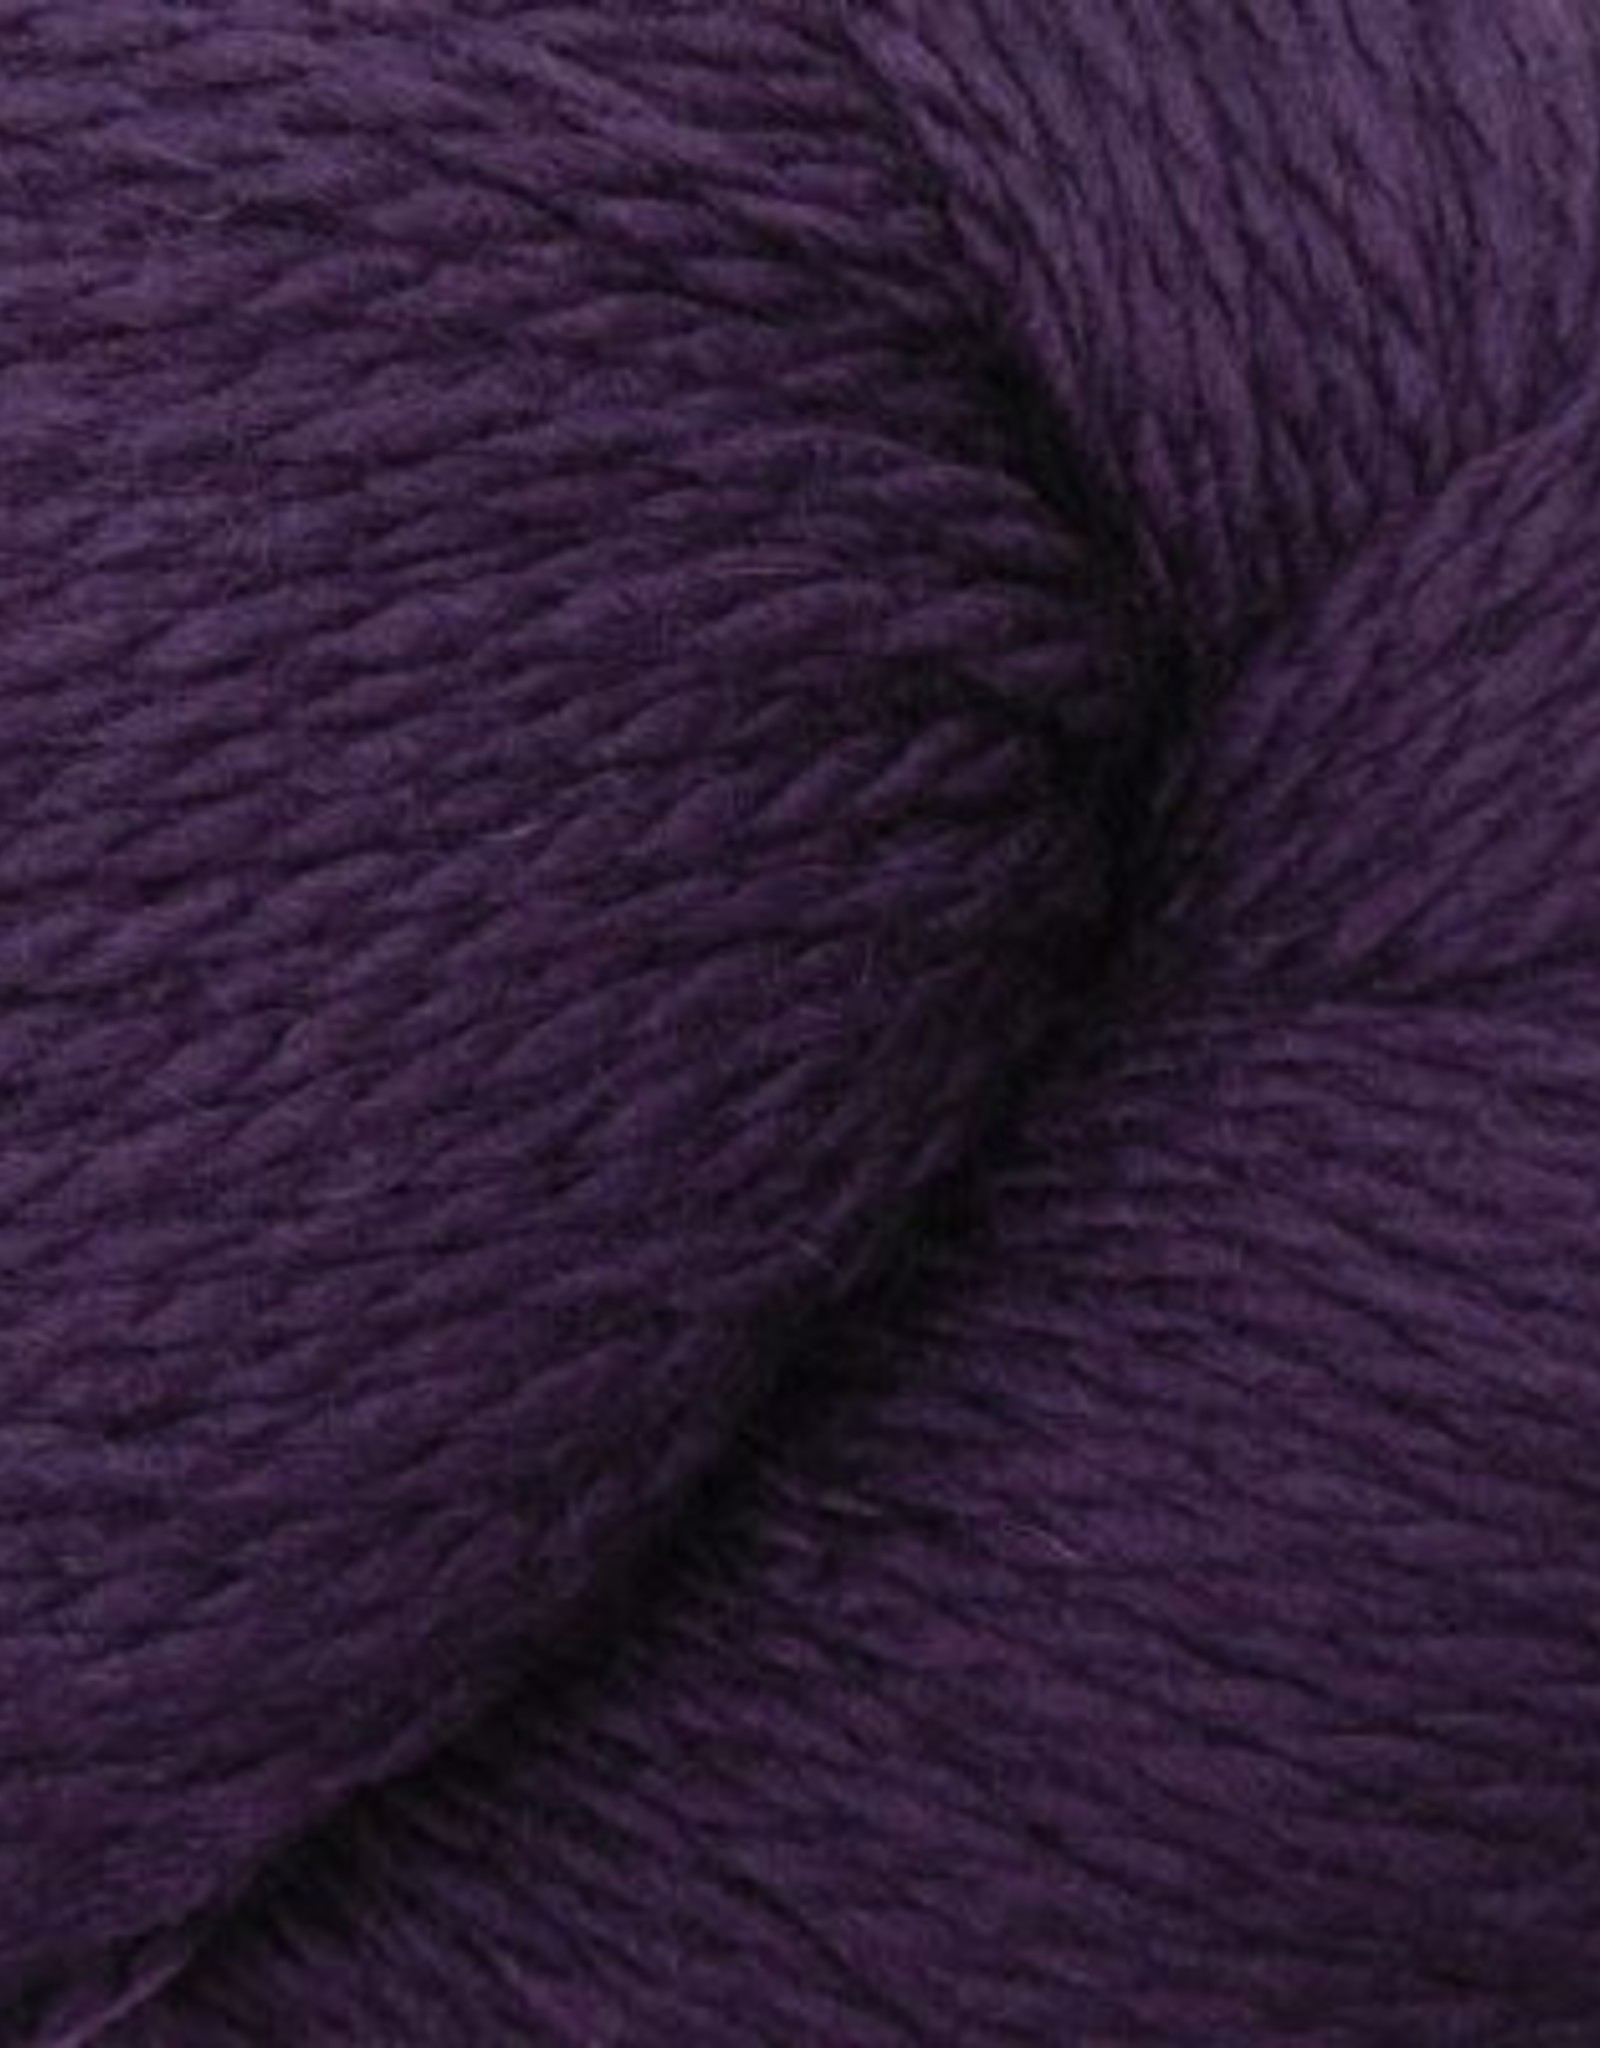 Cascade Eco Wool 3121 Blackberry Cordial